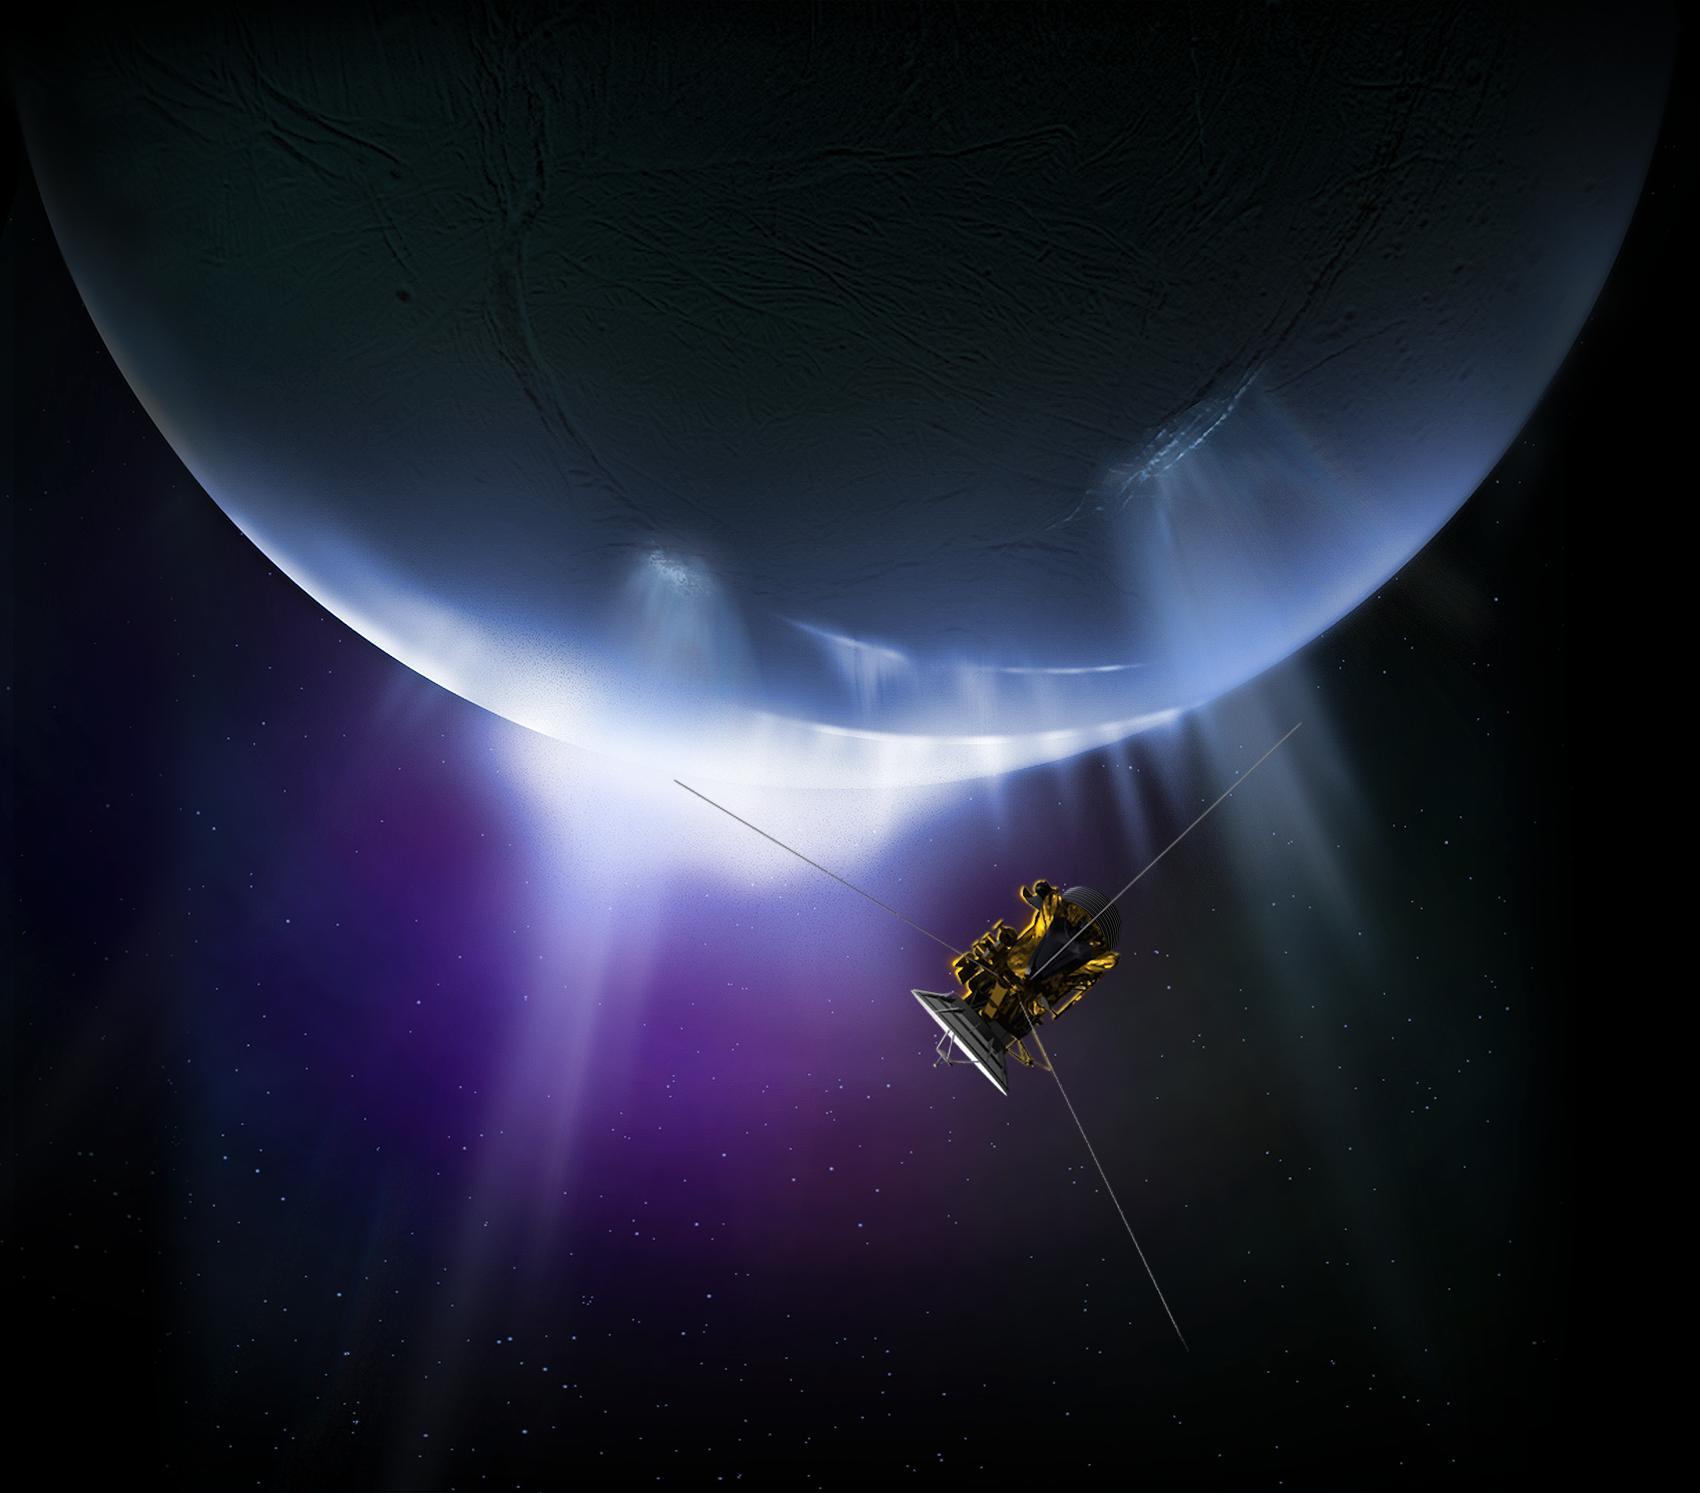 Images of Enceladus | 1700x1493